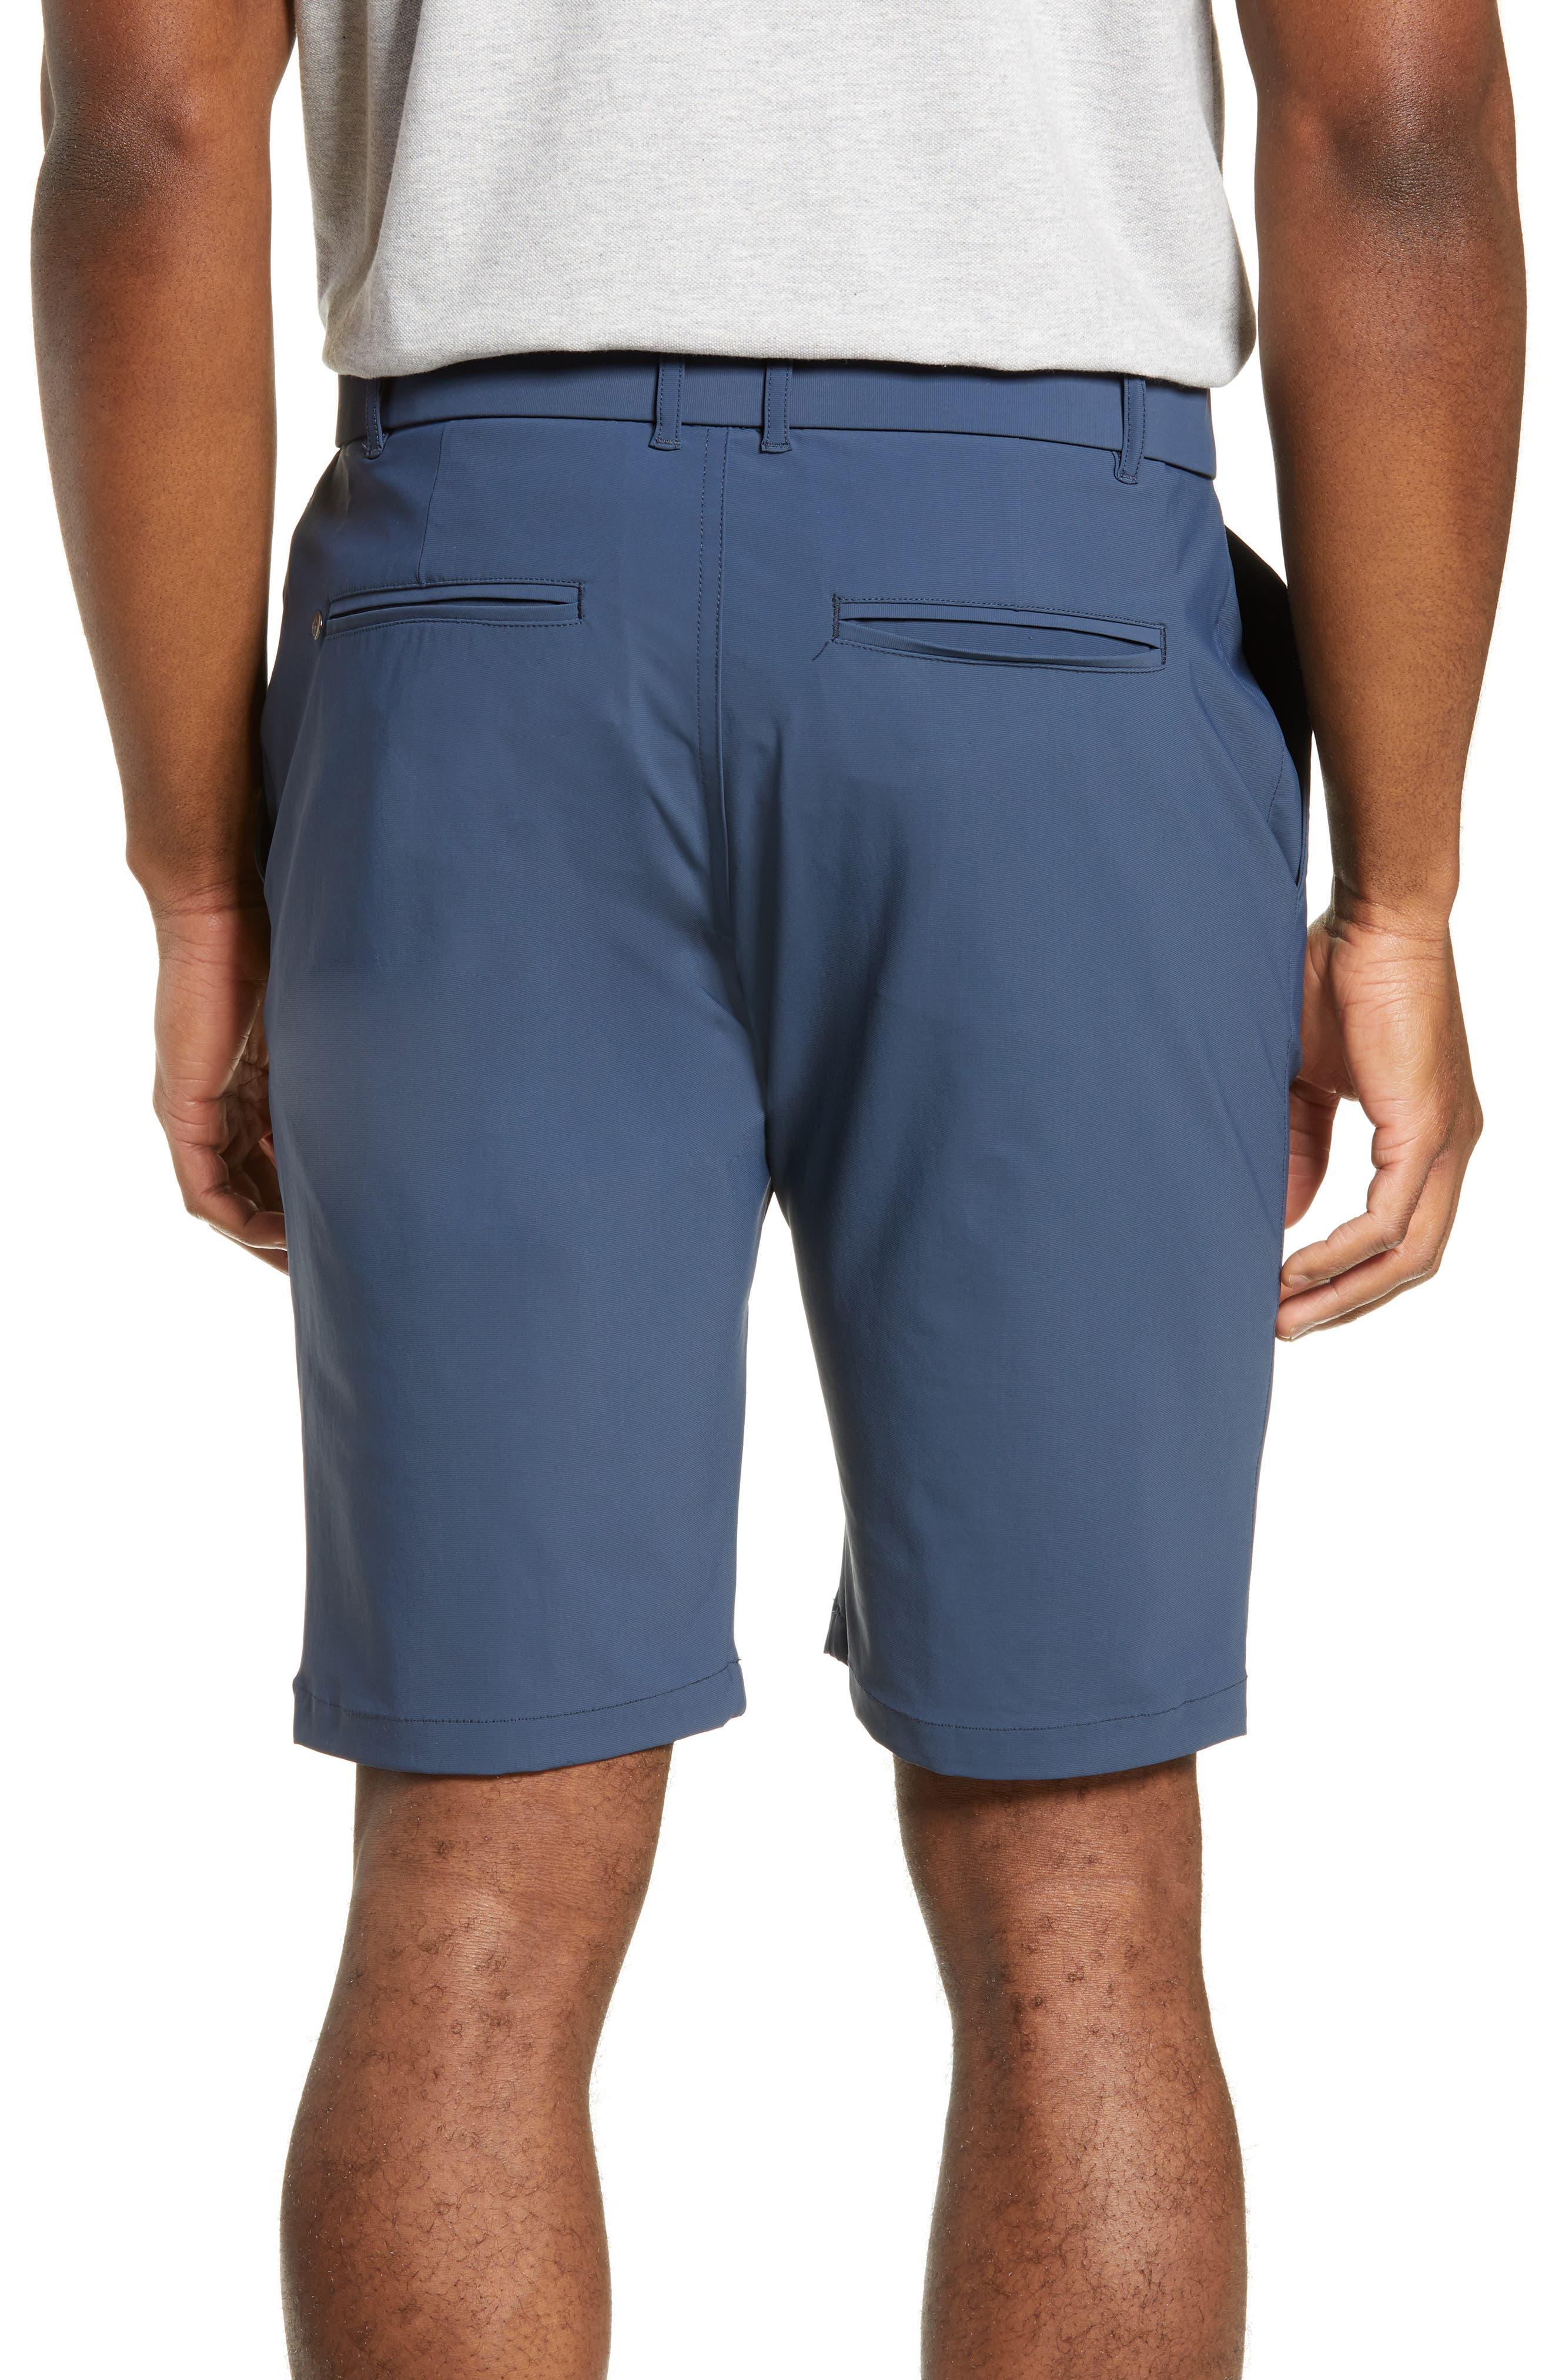 GREYSON, Montauk Technical Shorts, Alternate thumbnail 2, color, EEL